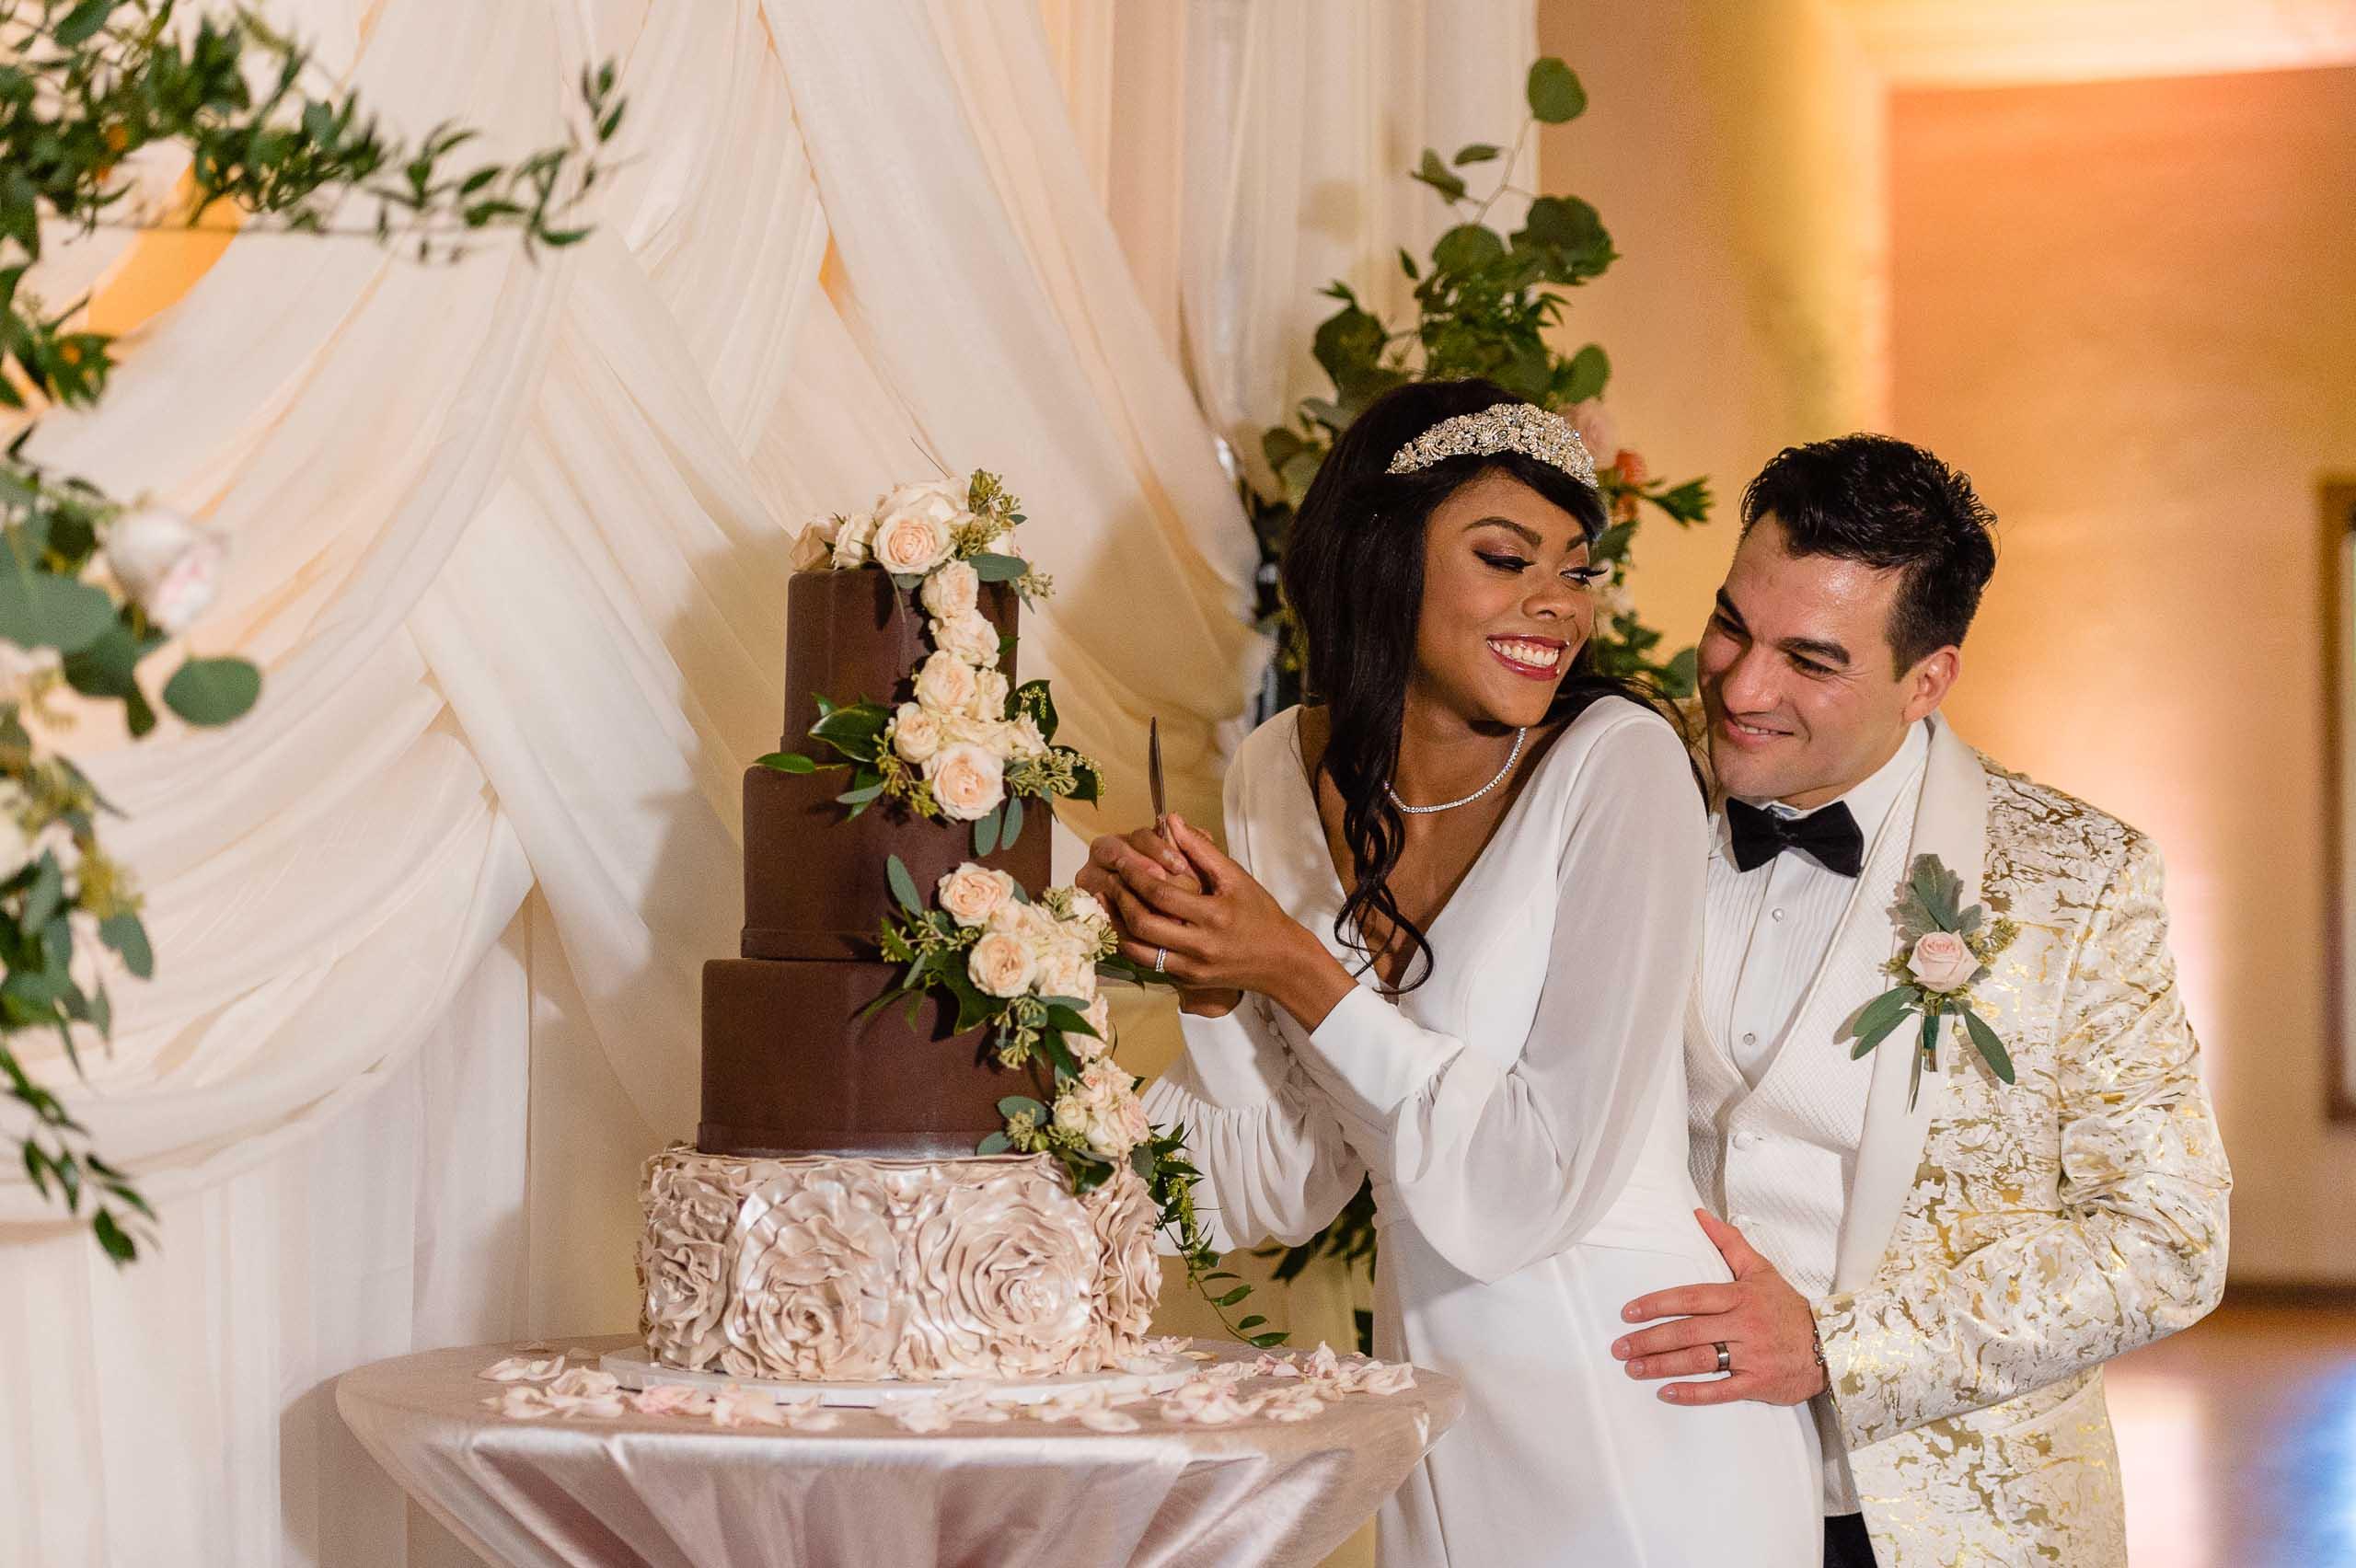 chandelier-of-gruene-winter-wedding-inspiration-_4S15688